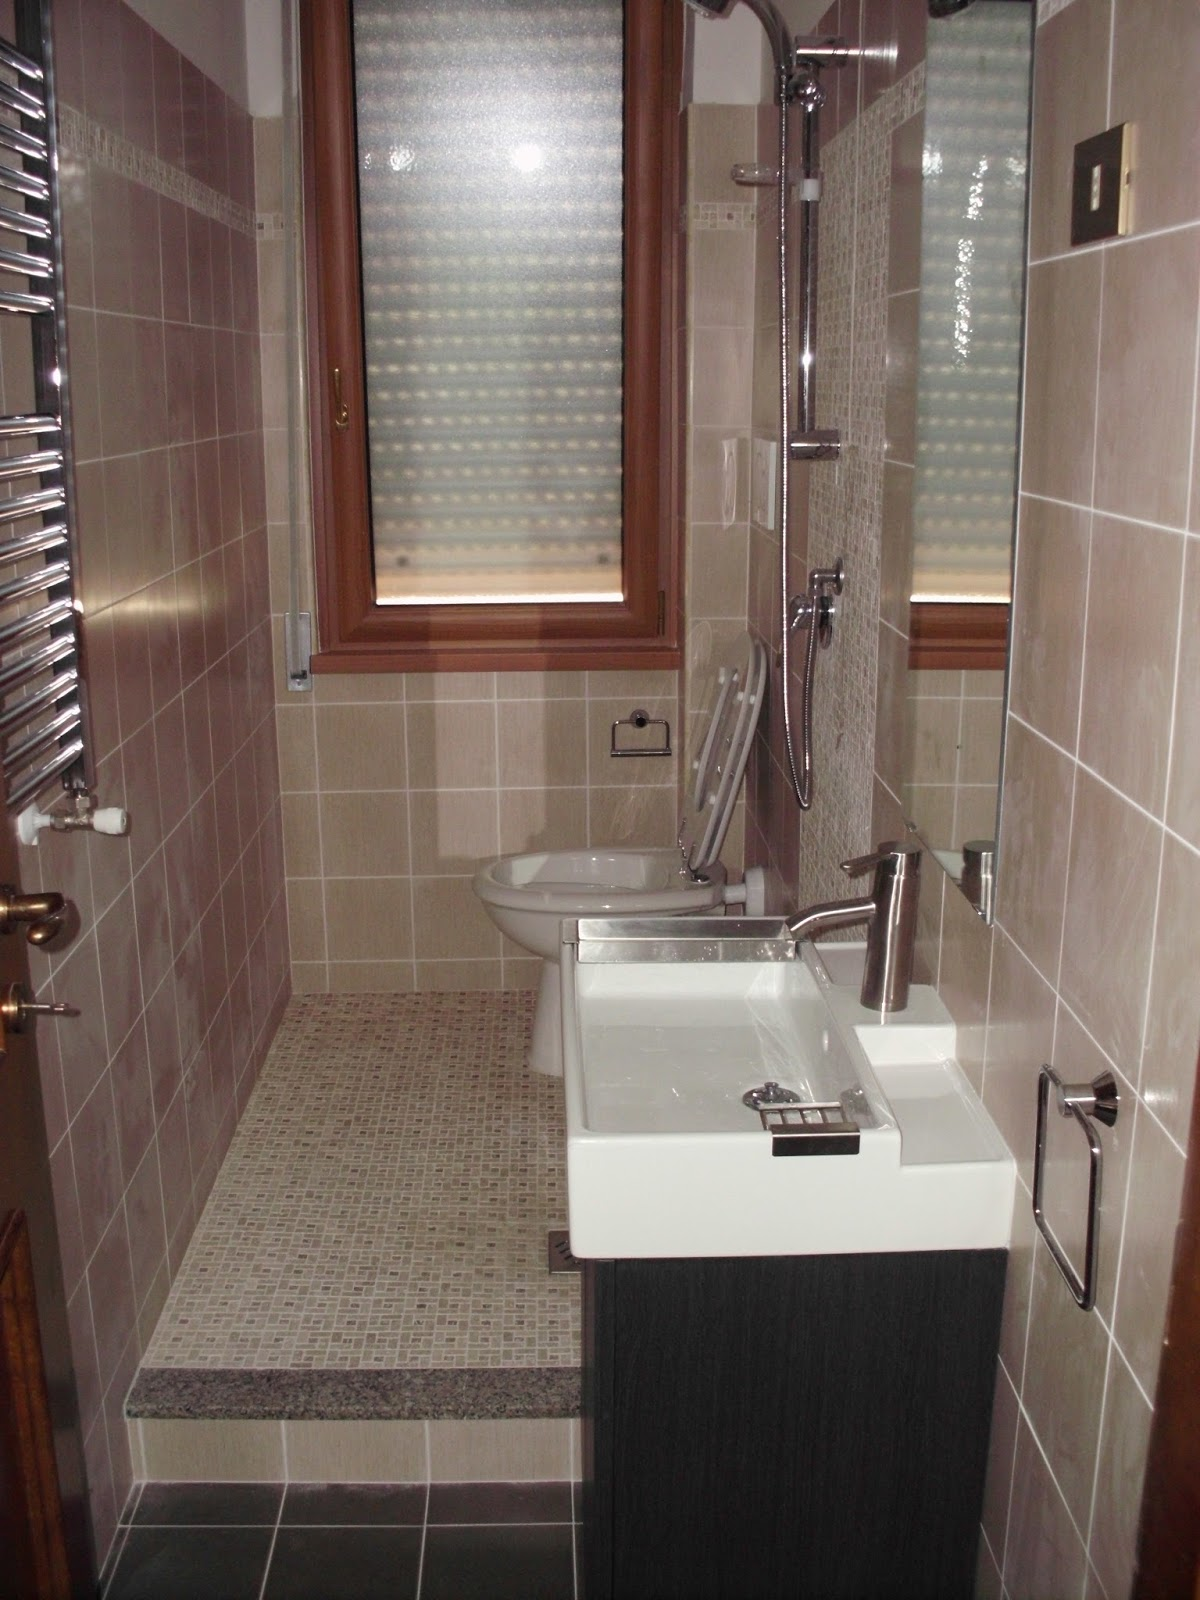 Fabulous edilizia roma edilizia roma snc with vasca doccia in muratura - Rinnovare vasca da bagno ...